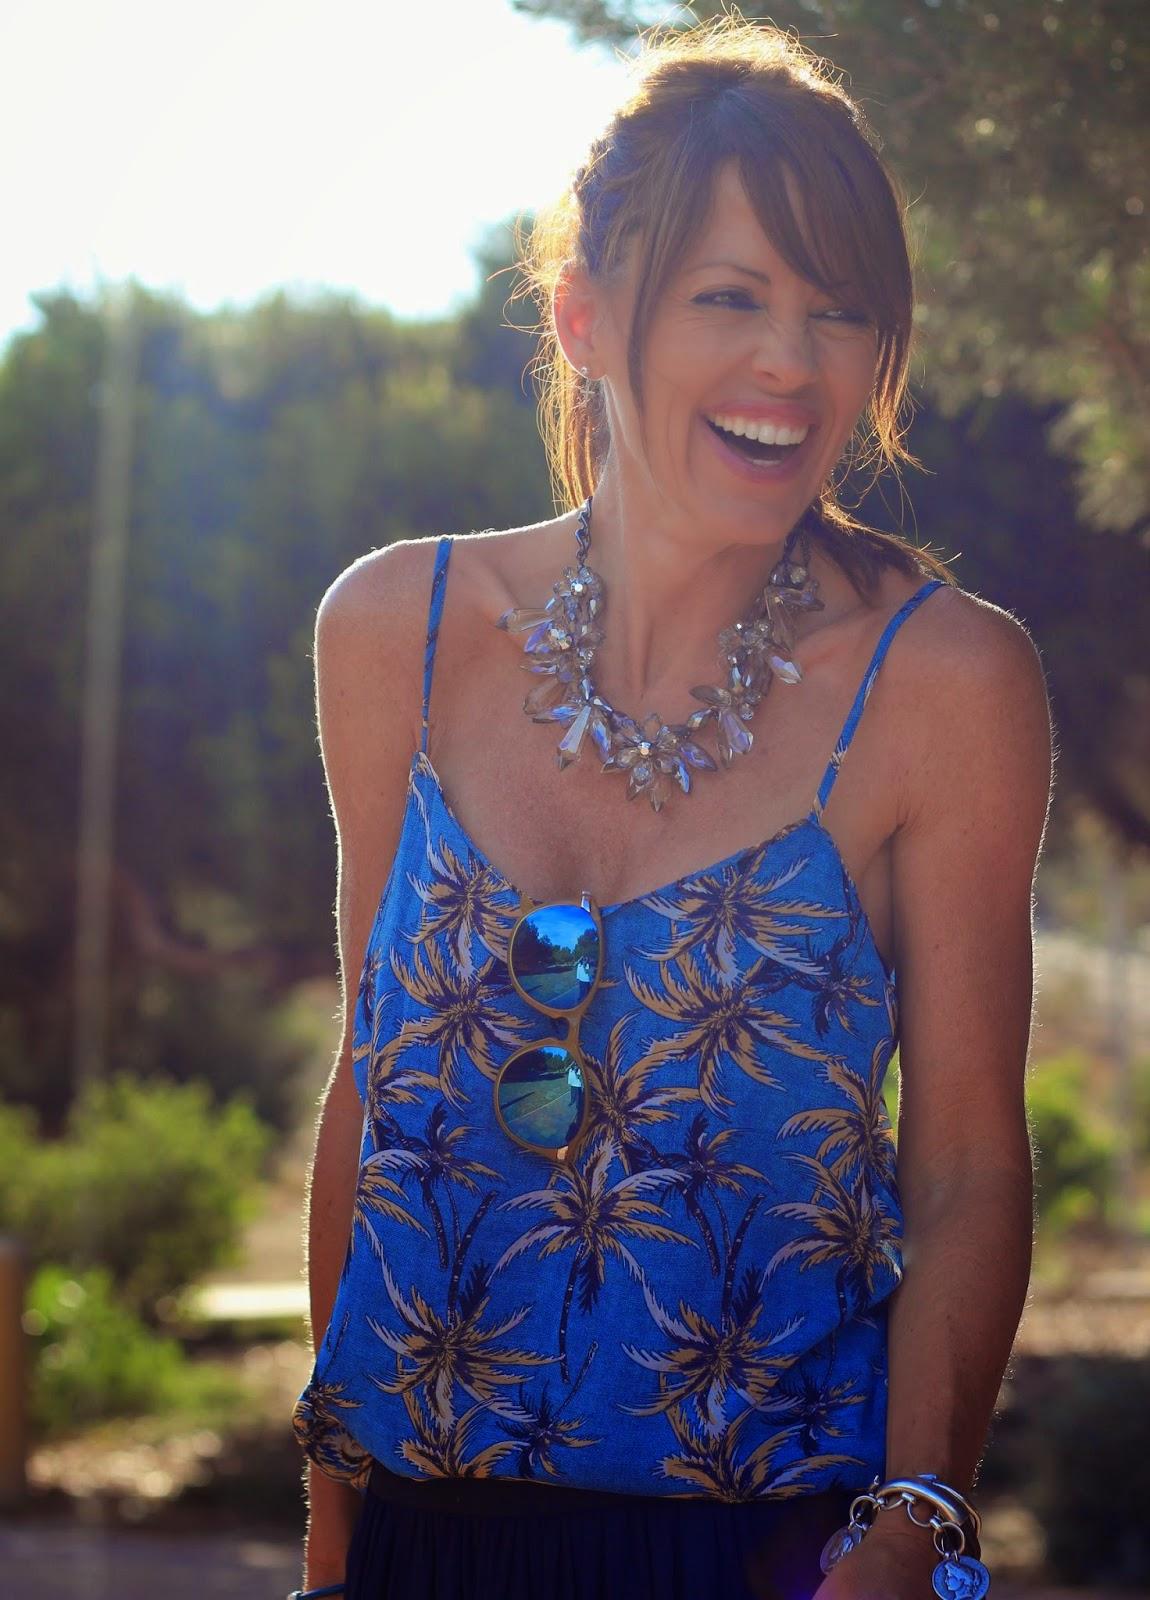 Outfit Verano 2014 - Tendencias 2014 - Palms print